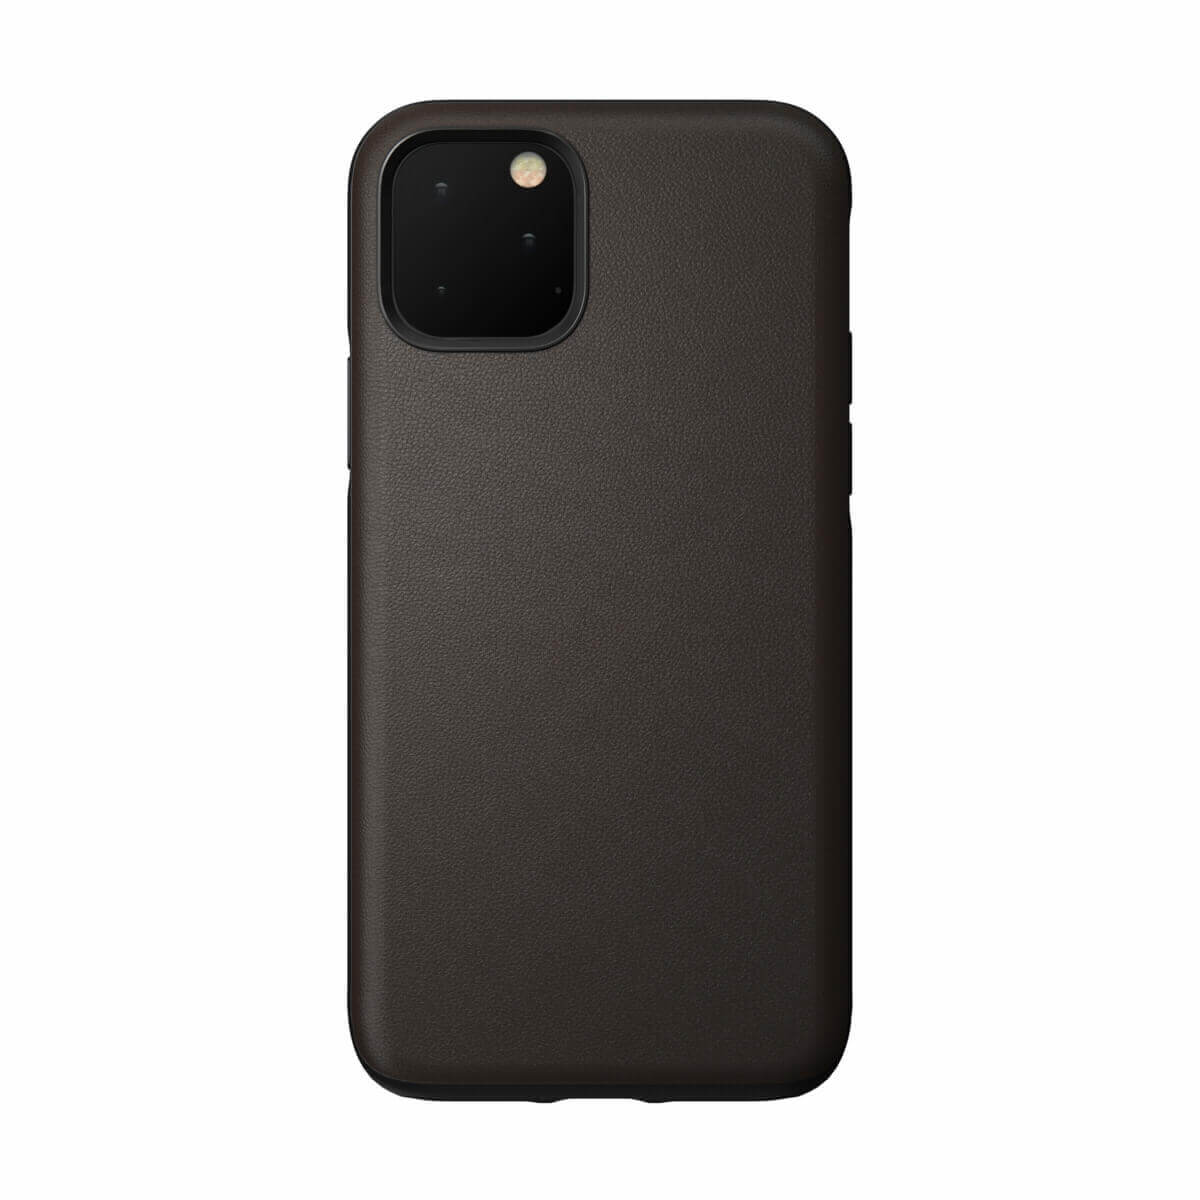 Nomad Leather Rugged Waterproof Case — кожен (естествена кожа) кейс за iPhone 11 Pro (кафяв) - 2